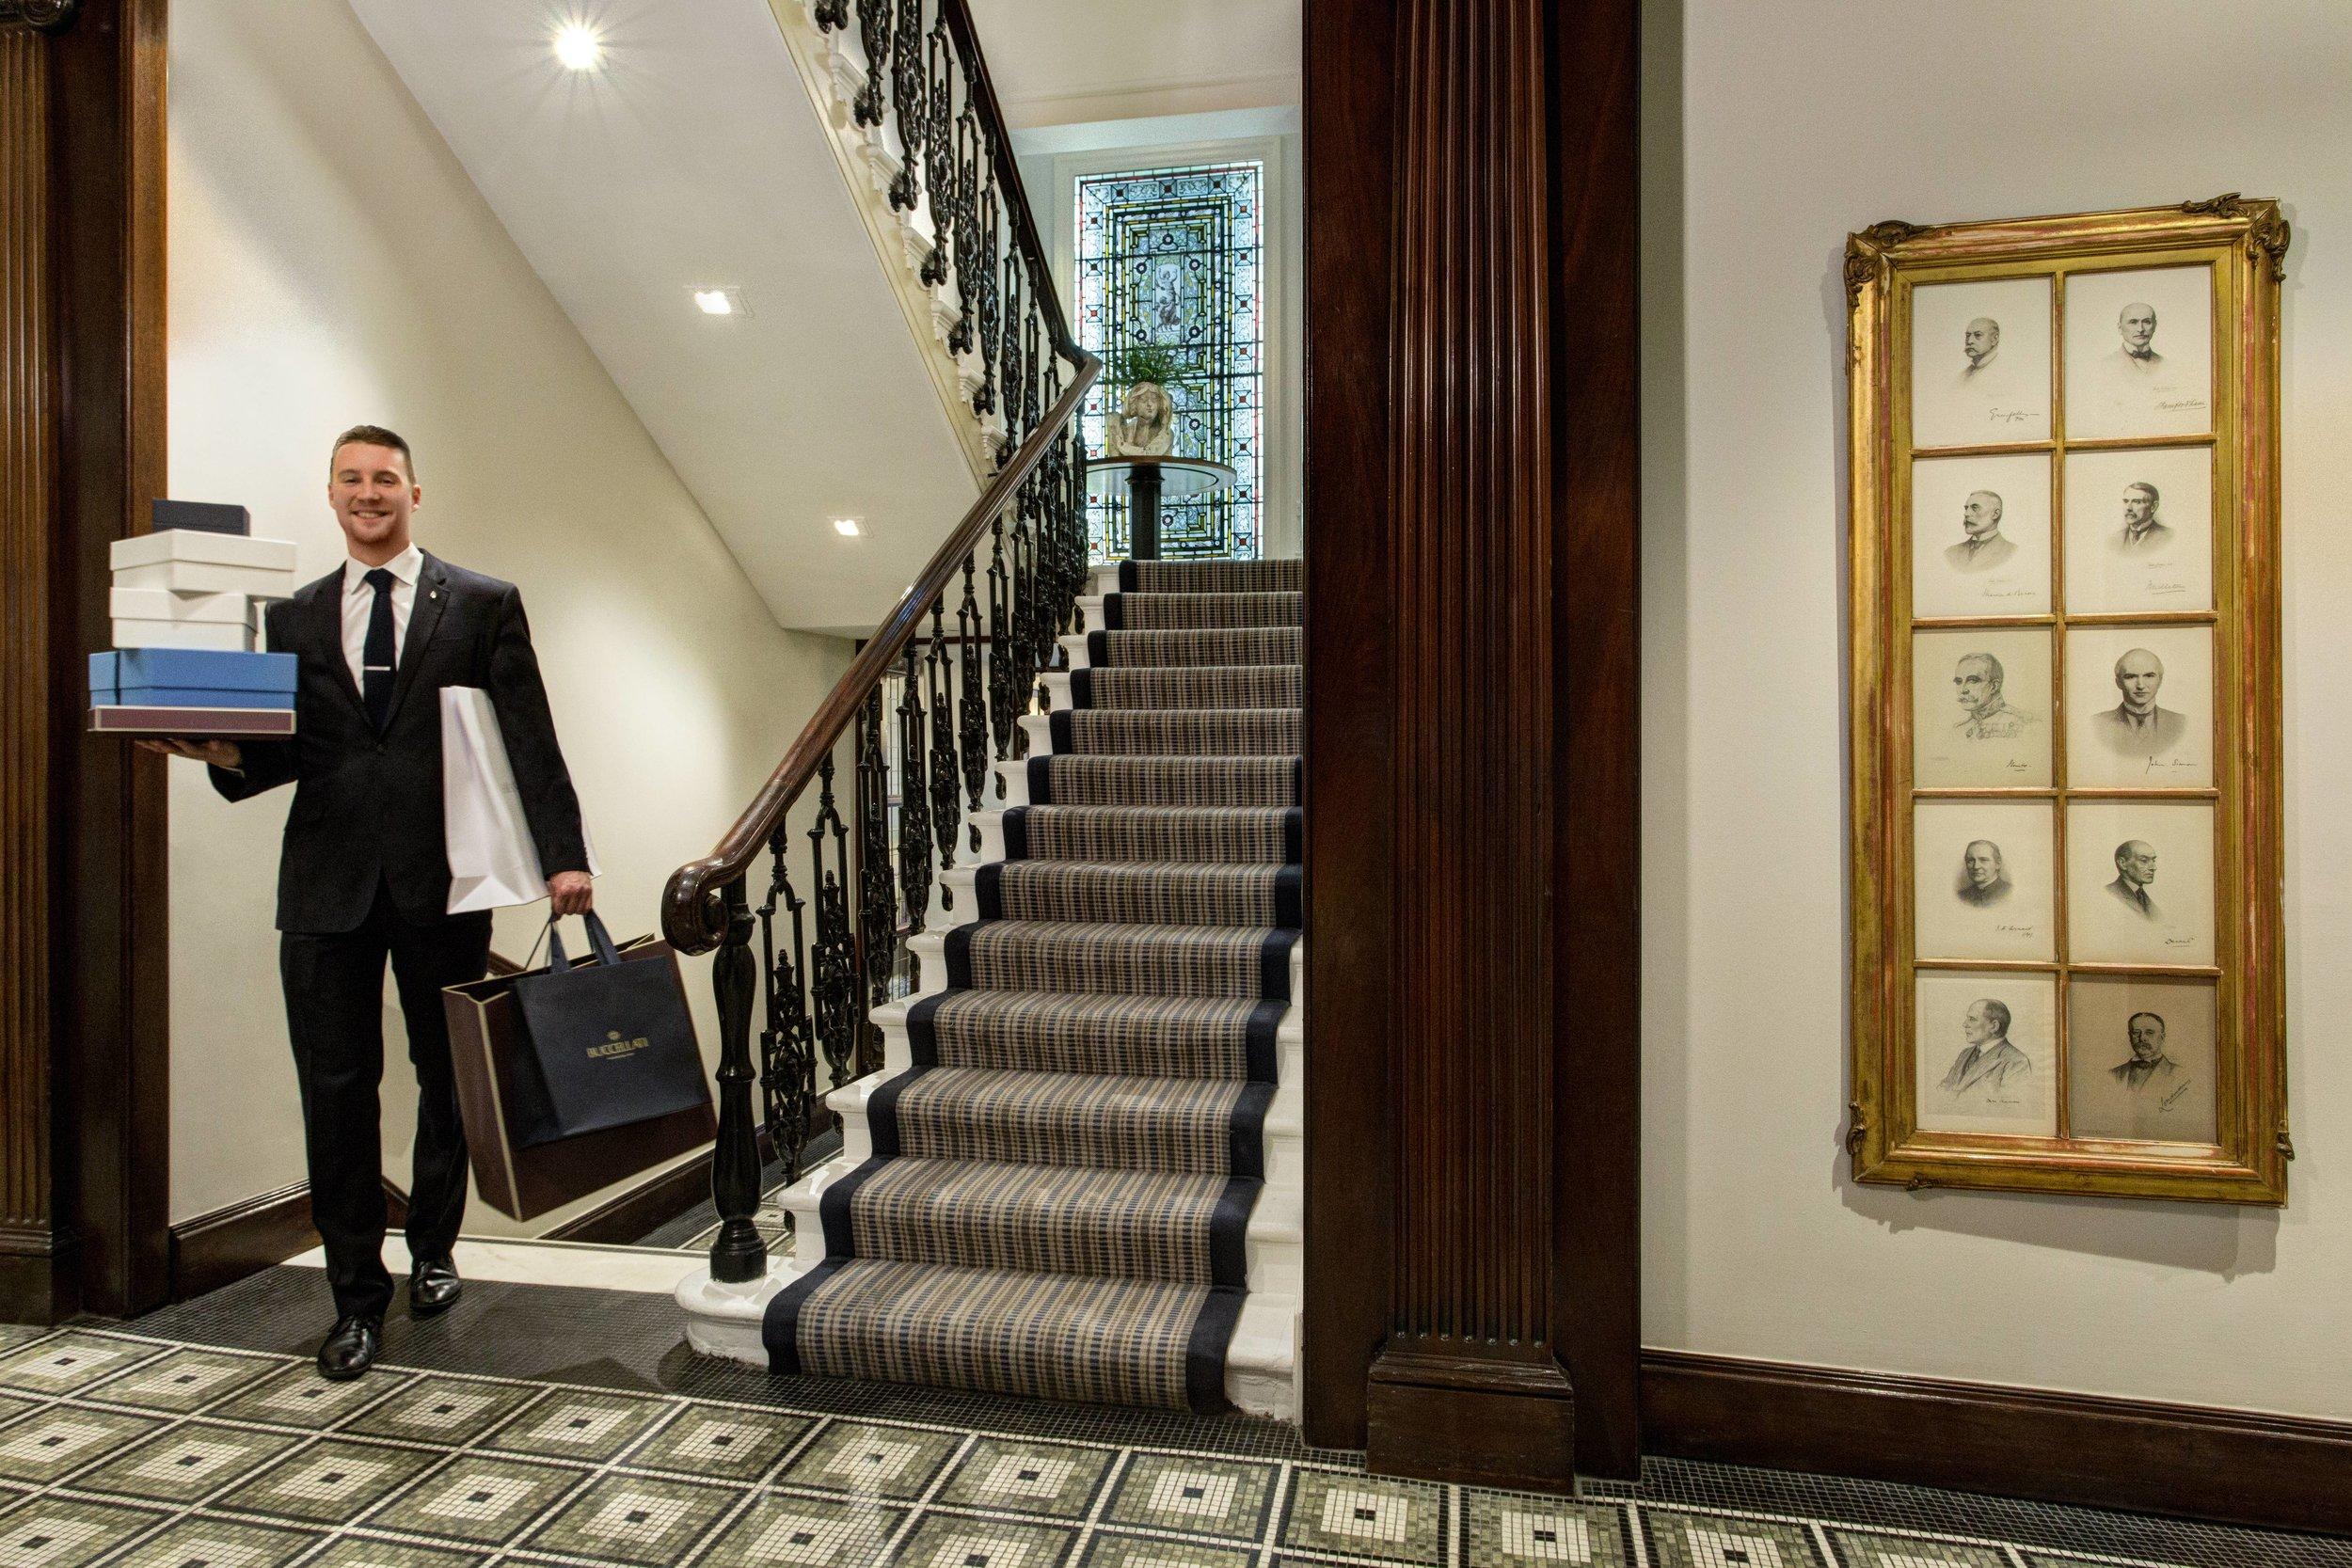 6 RFH Brown's Hotel - Dover Street Stairs 6449R2 JG Oct 16.jpg